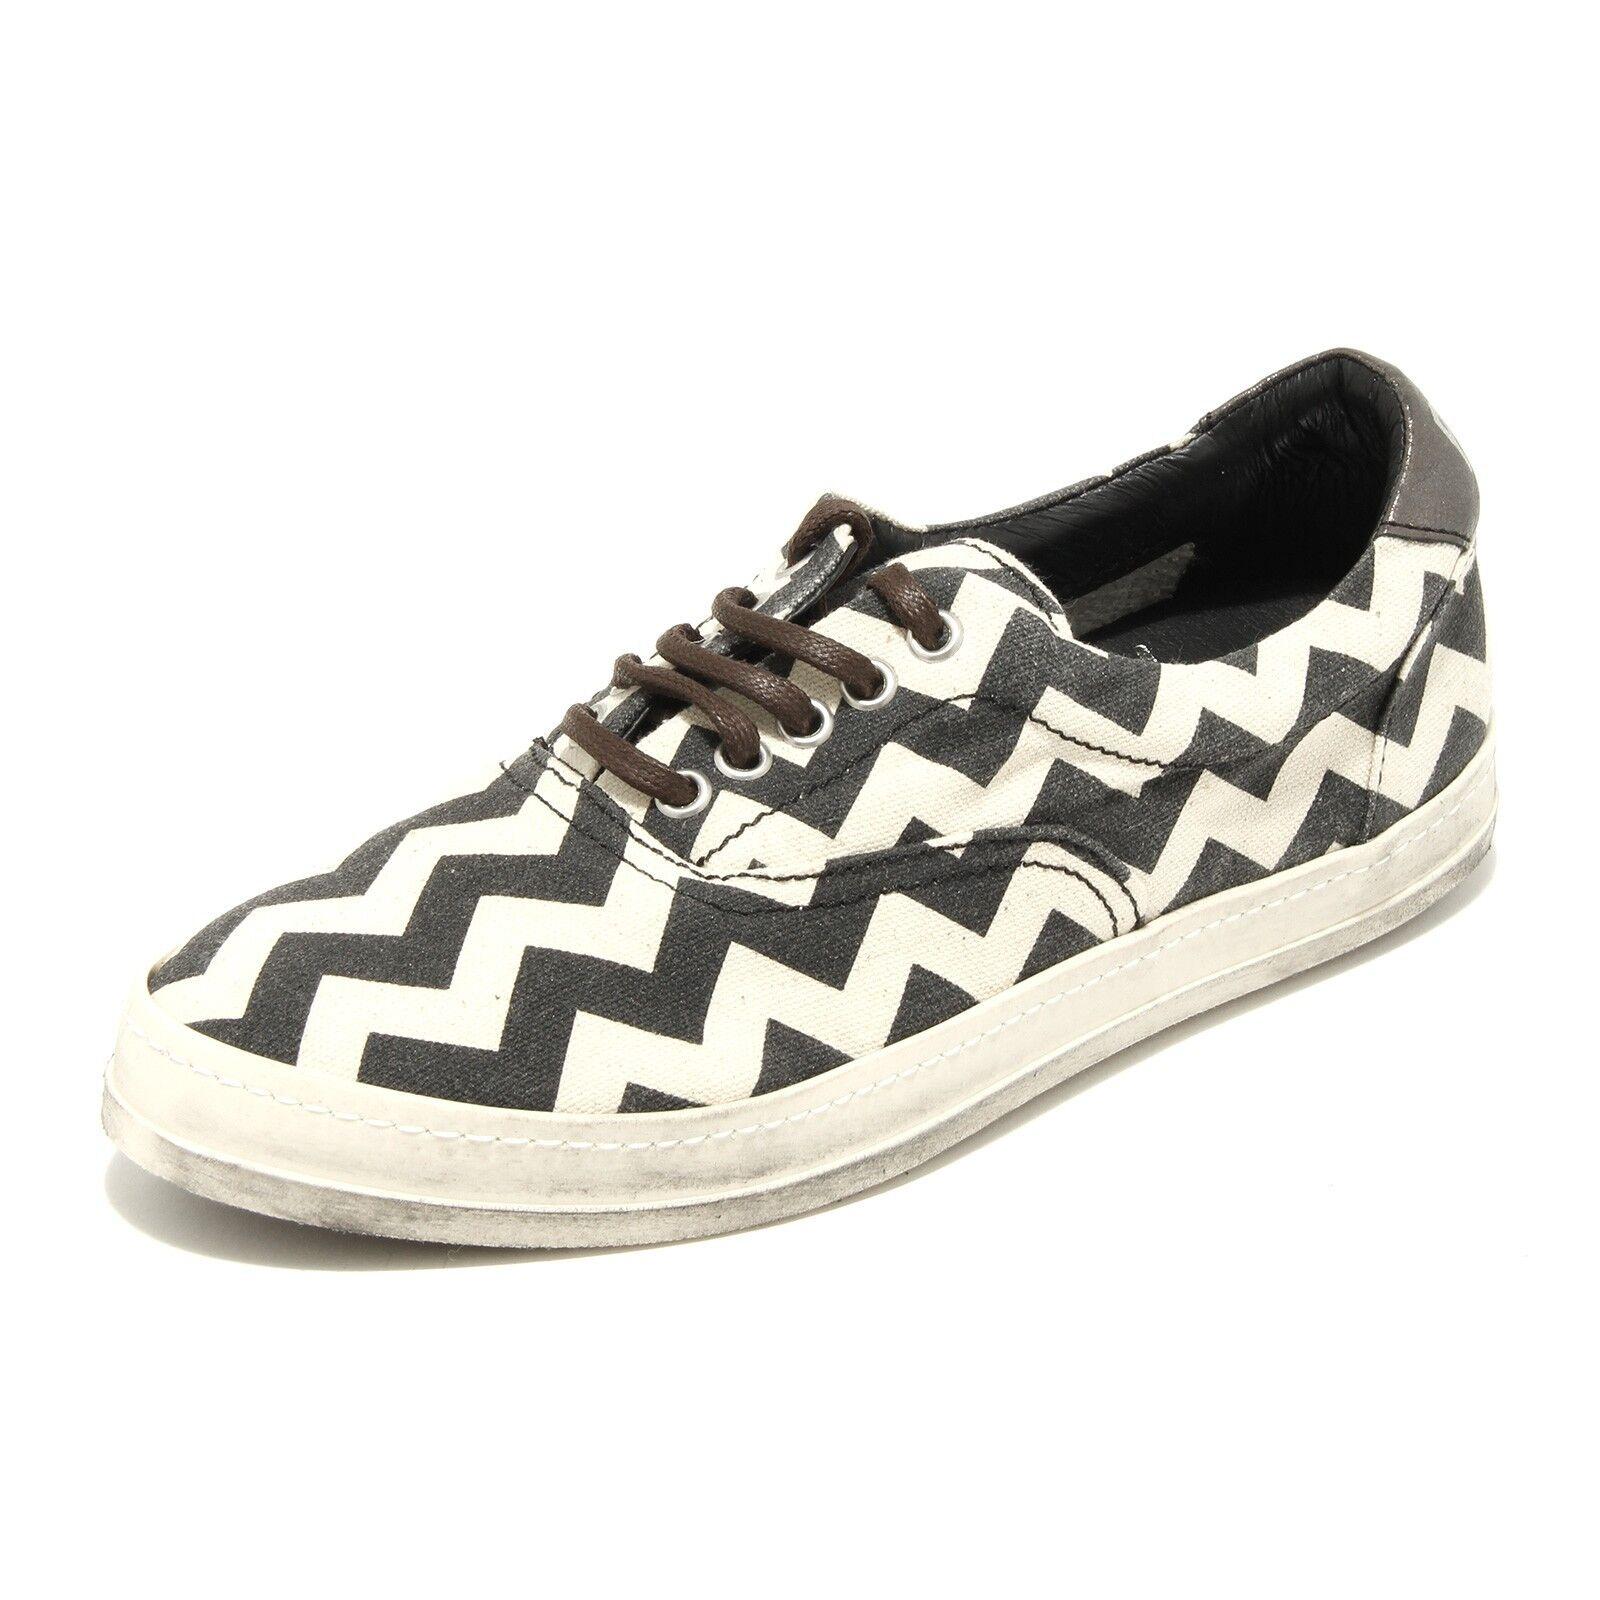 9840G P448 sneakers uomo P448 9840G chevron scarpe shoes men ae7716